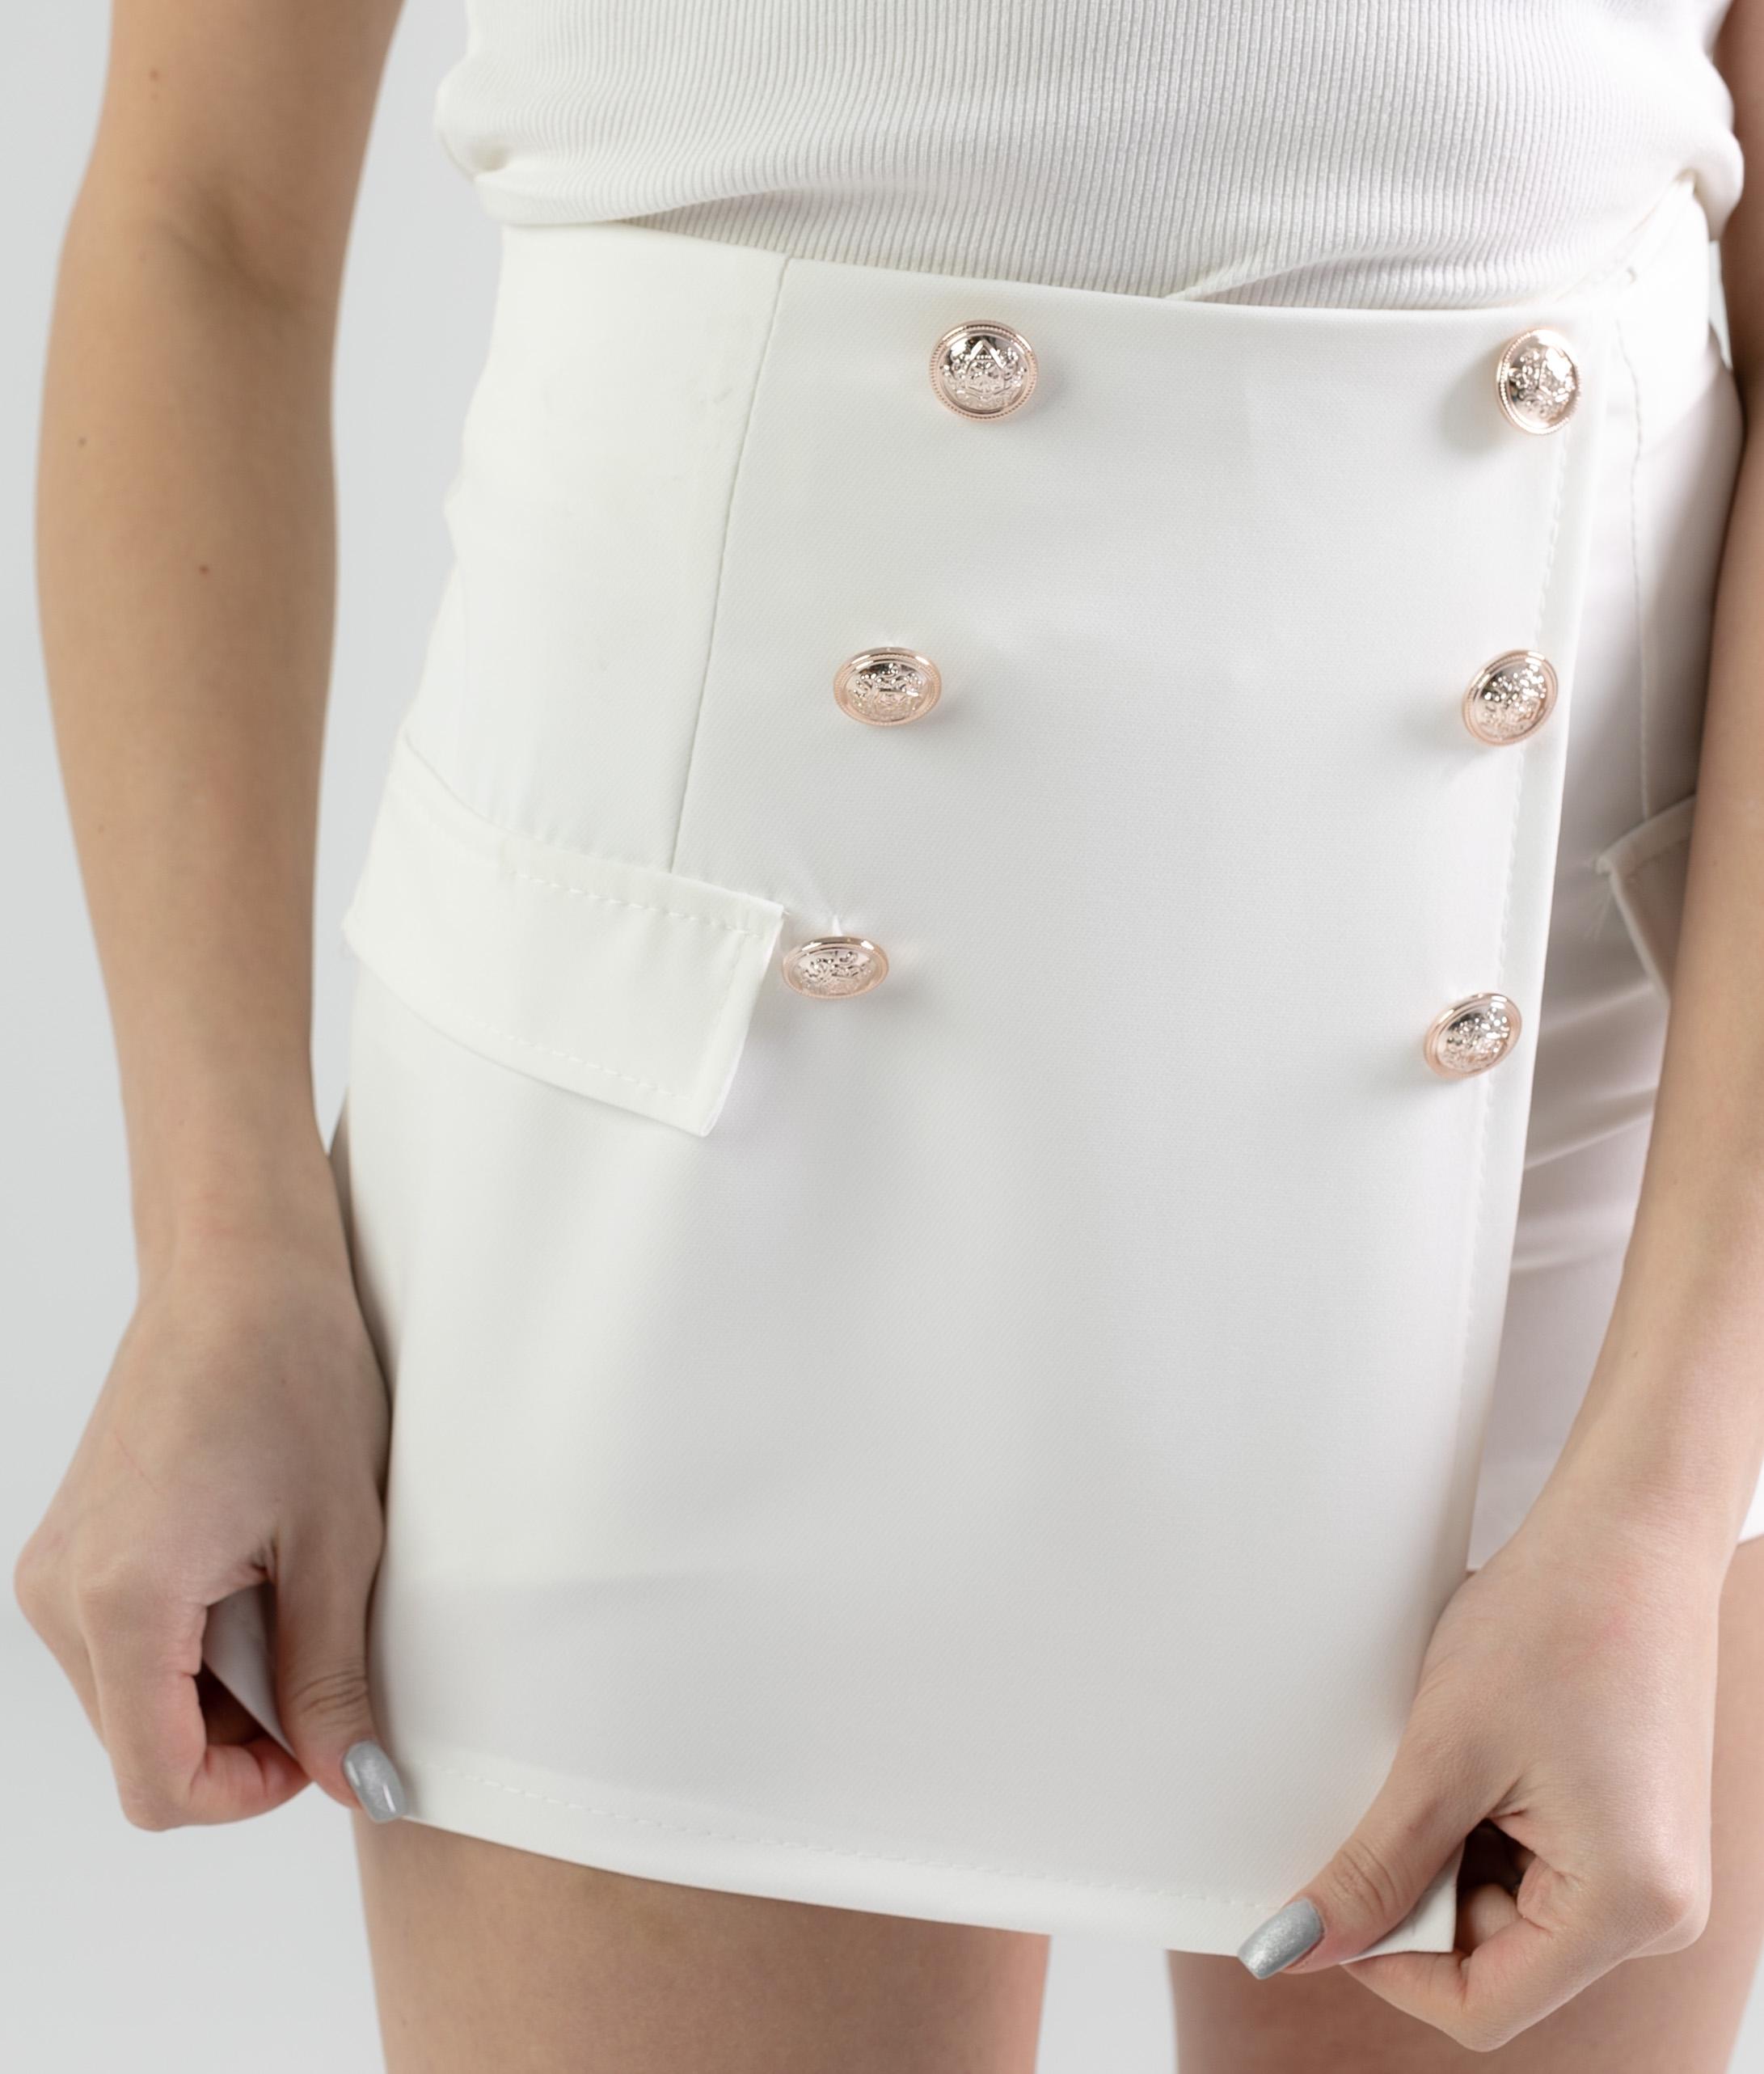 SKIRT PANTS PAREIL - WHITE